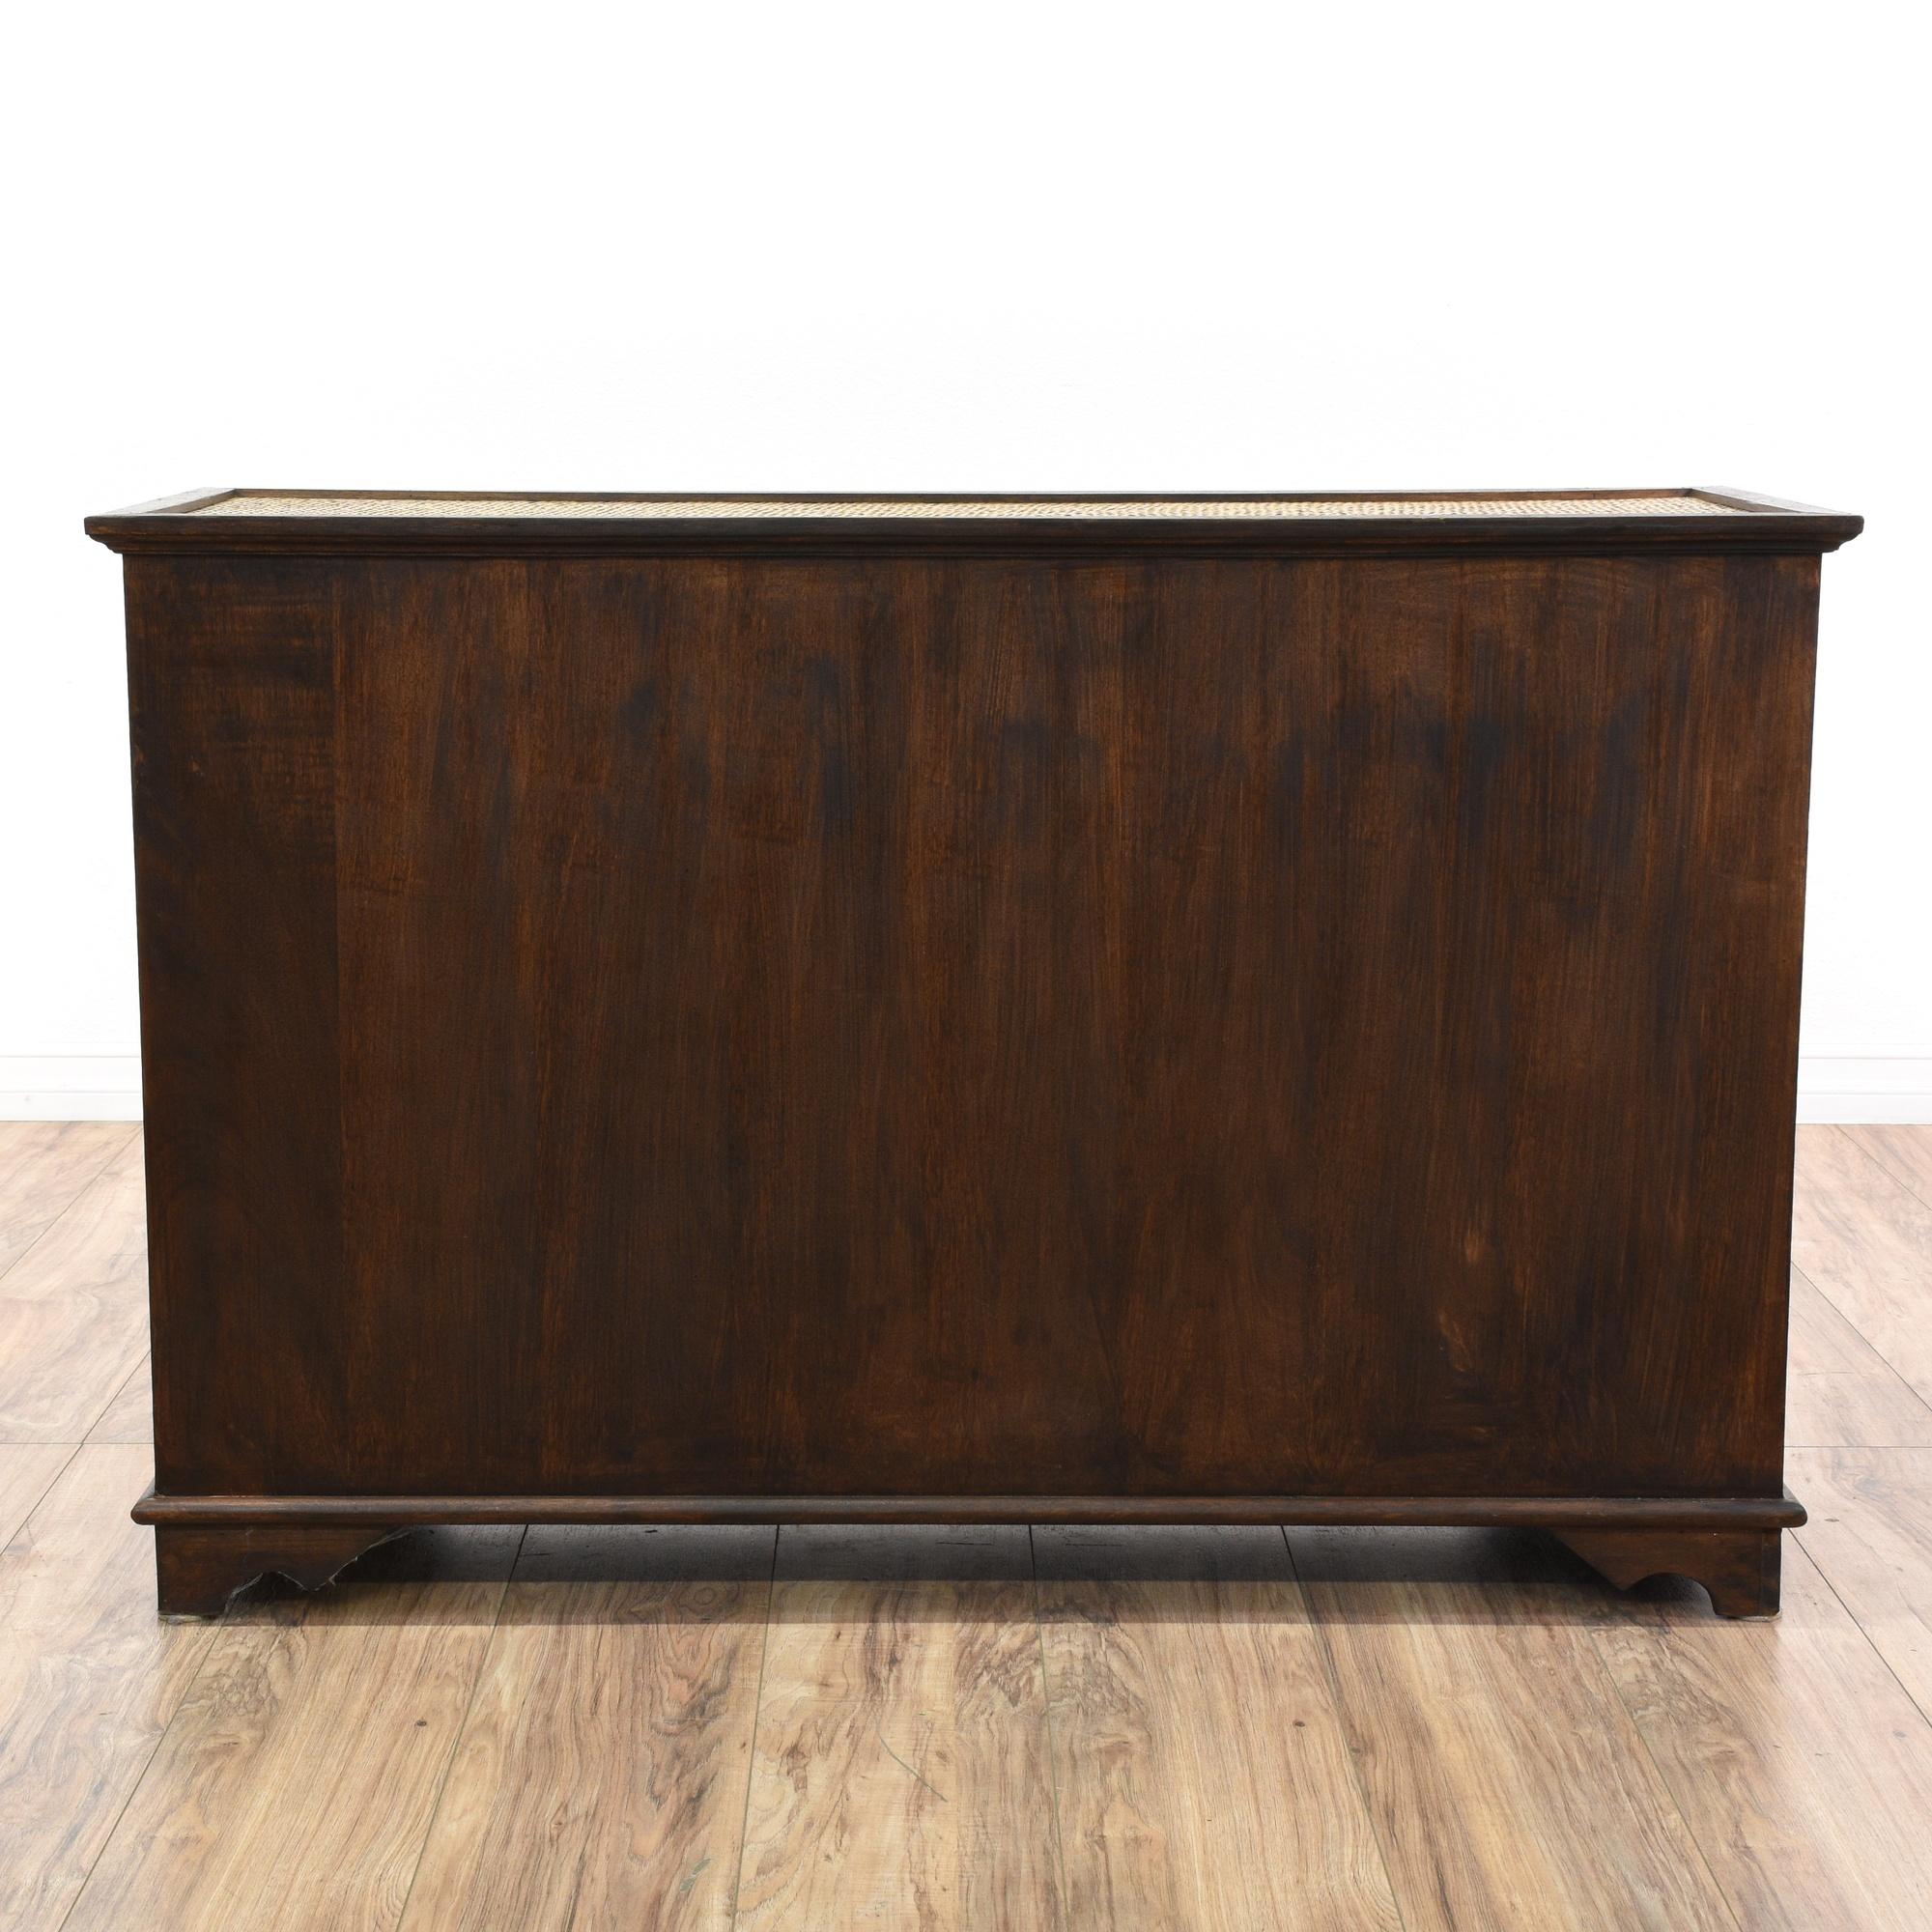 Wood Rattan Dresser Buffet Sideboard Loveseat Vintage